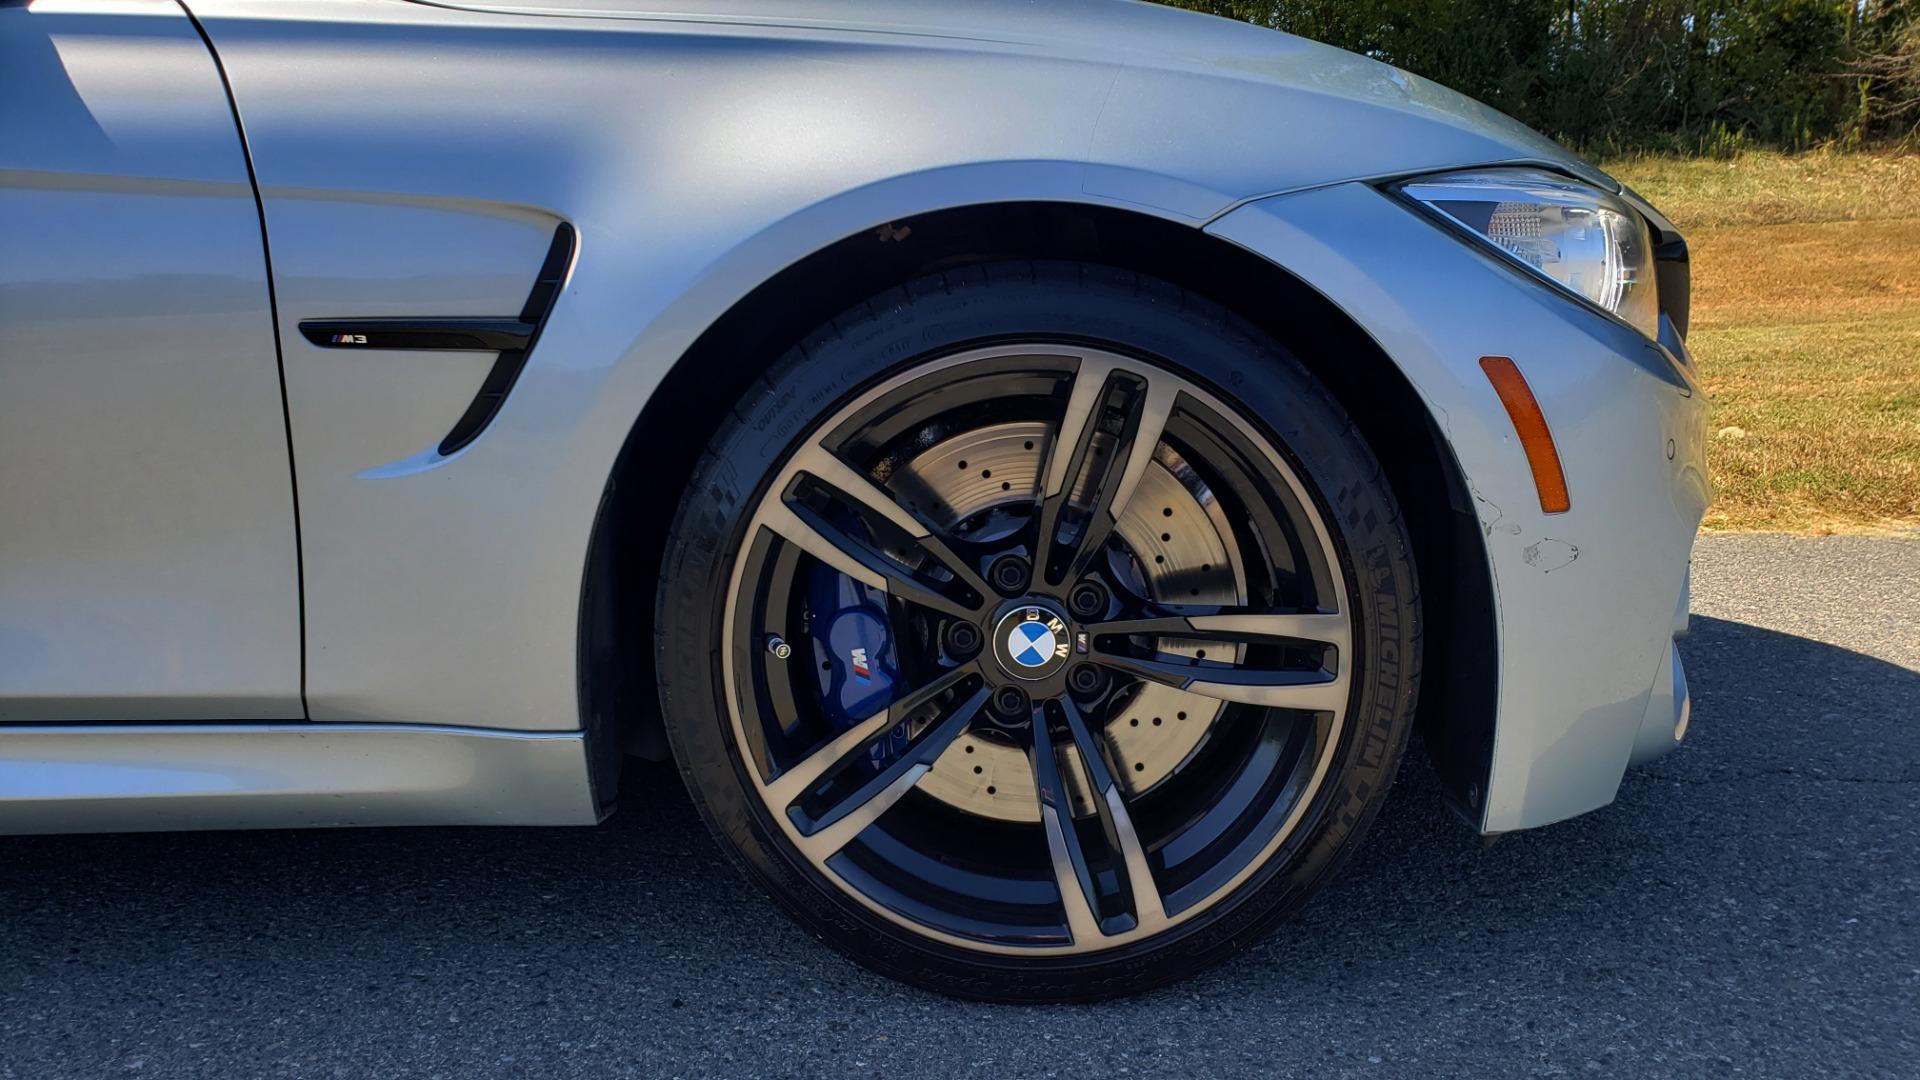 Used 2015 BMW M3 EXECUTIVE PKG / NAV / CAMERA / HUD / CARBON FIBER ROOF for sale Sold at Formula Imports in Charlotte NC 28227 94